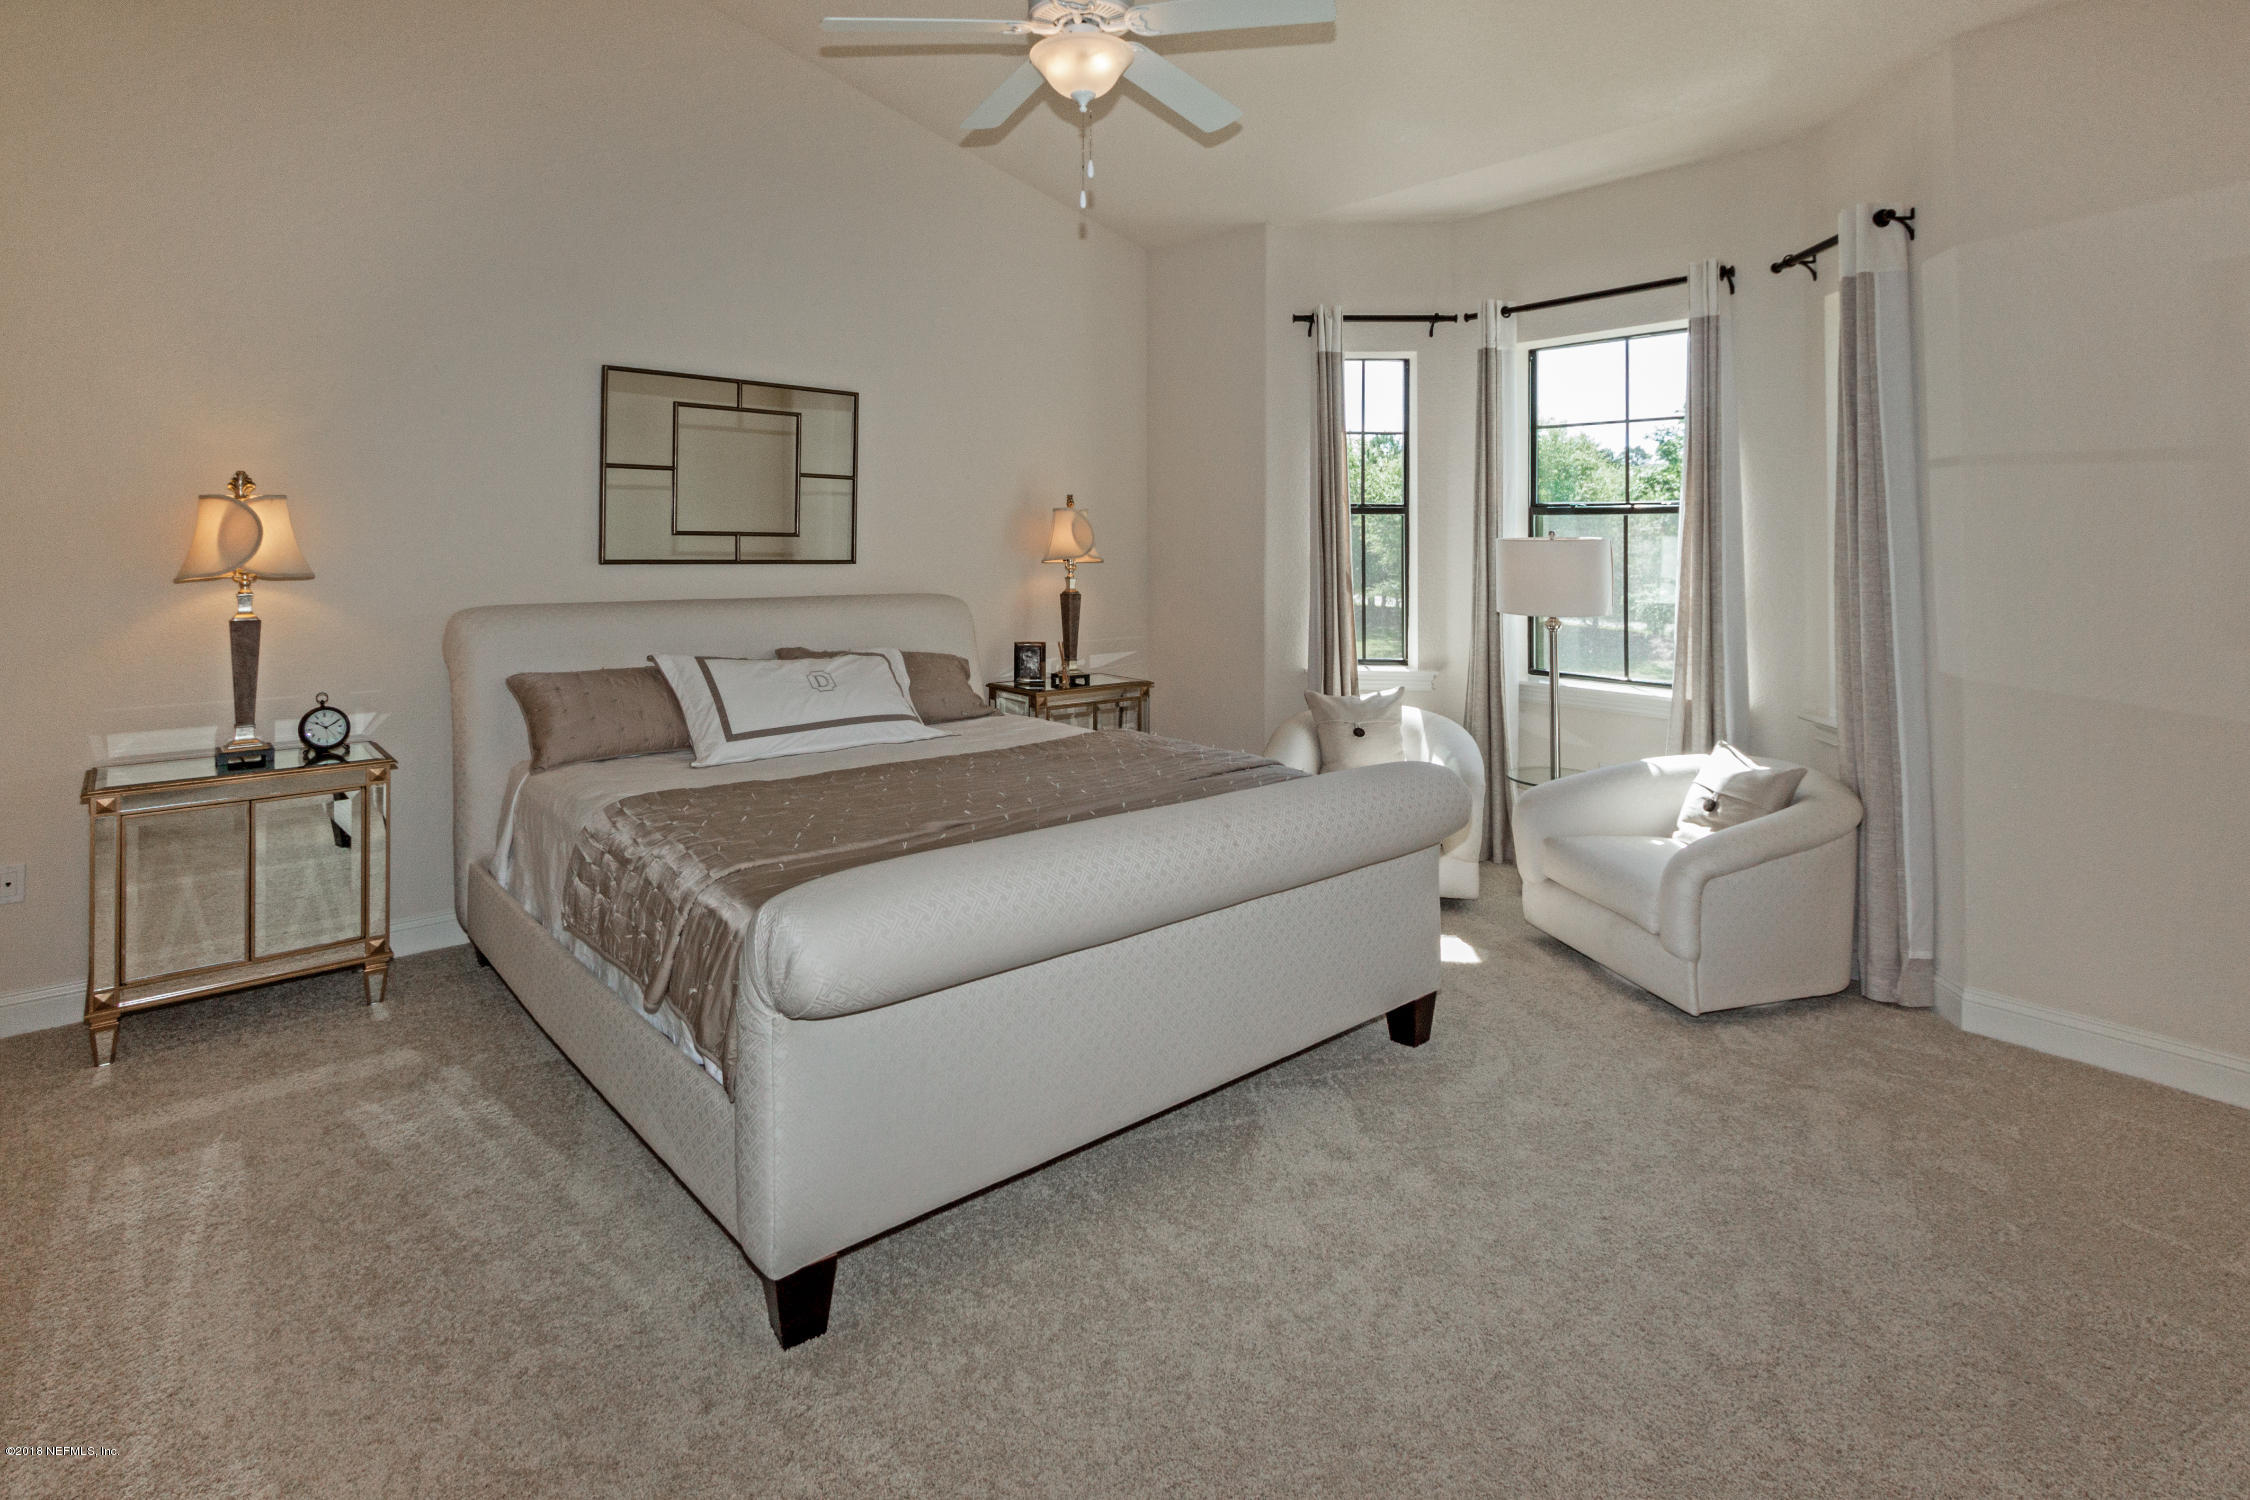 198 LATERRA LINKS- ST AUGUSTINE- FLORIDA 32092, 3 Bedrooms Bedrooms, ,3 BathroomsBathrooms,Condo,For sale,LATERRA LINKS,966208